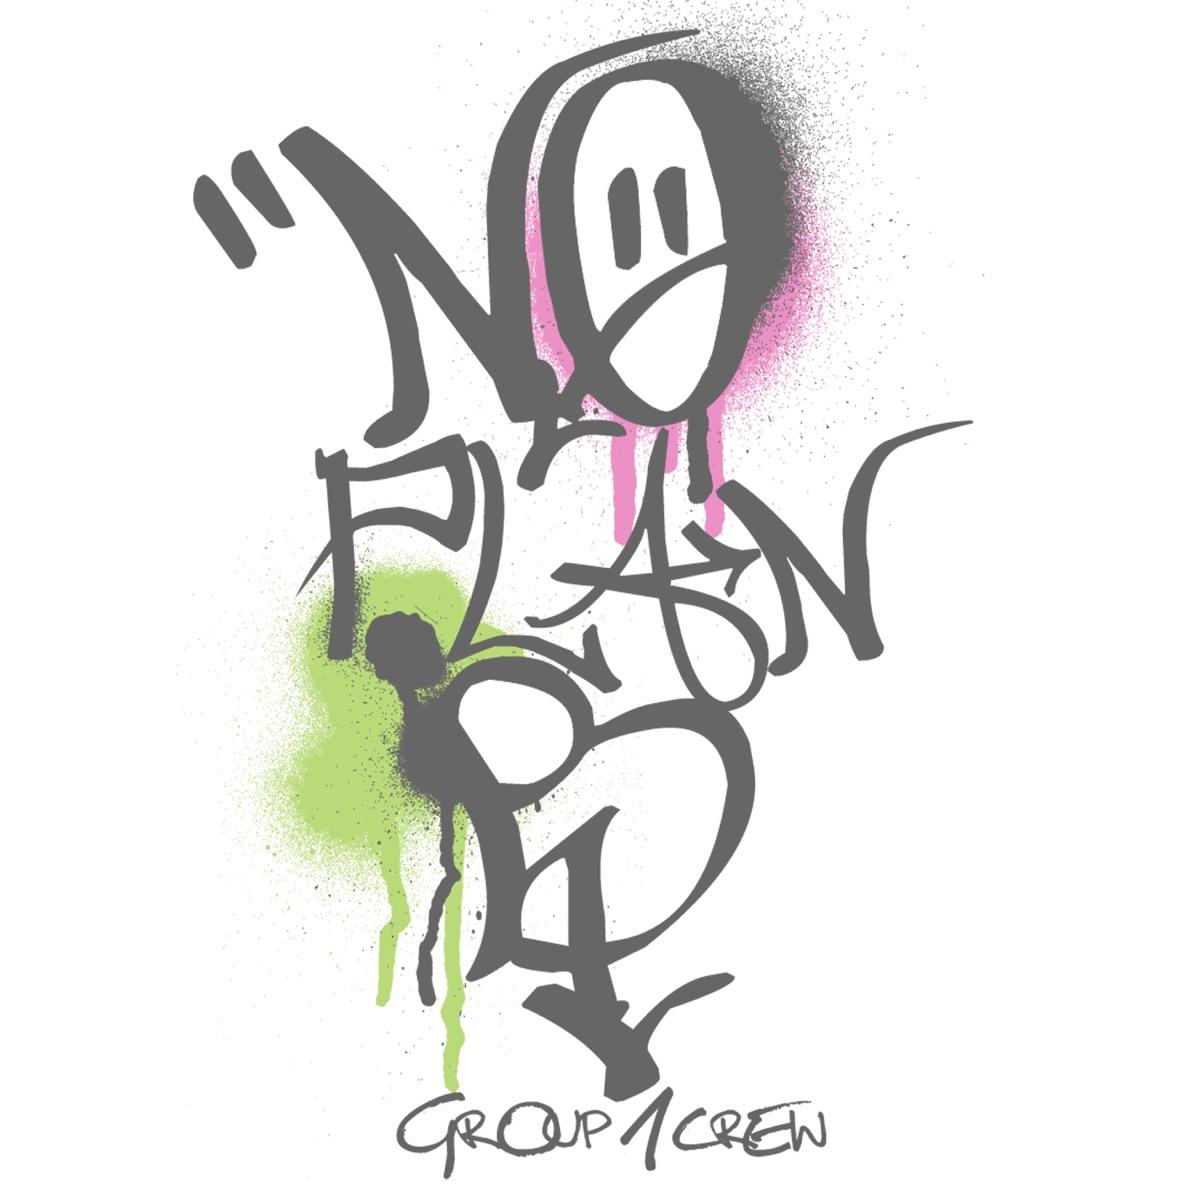 No Plan B - EP Group 1 Crew CD cover